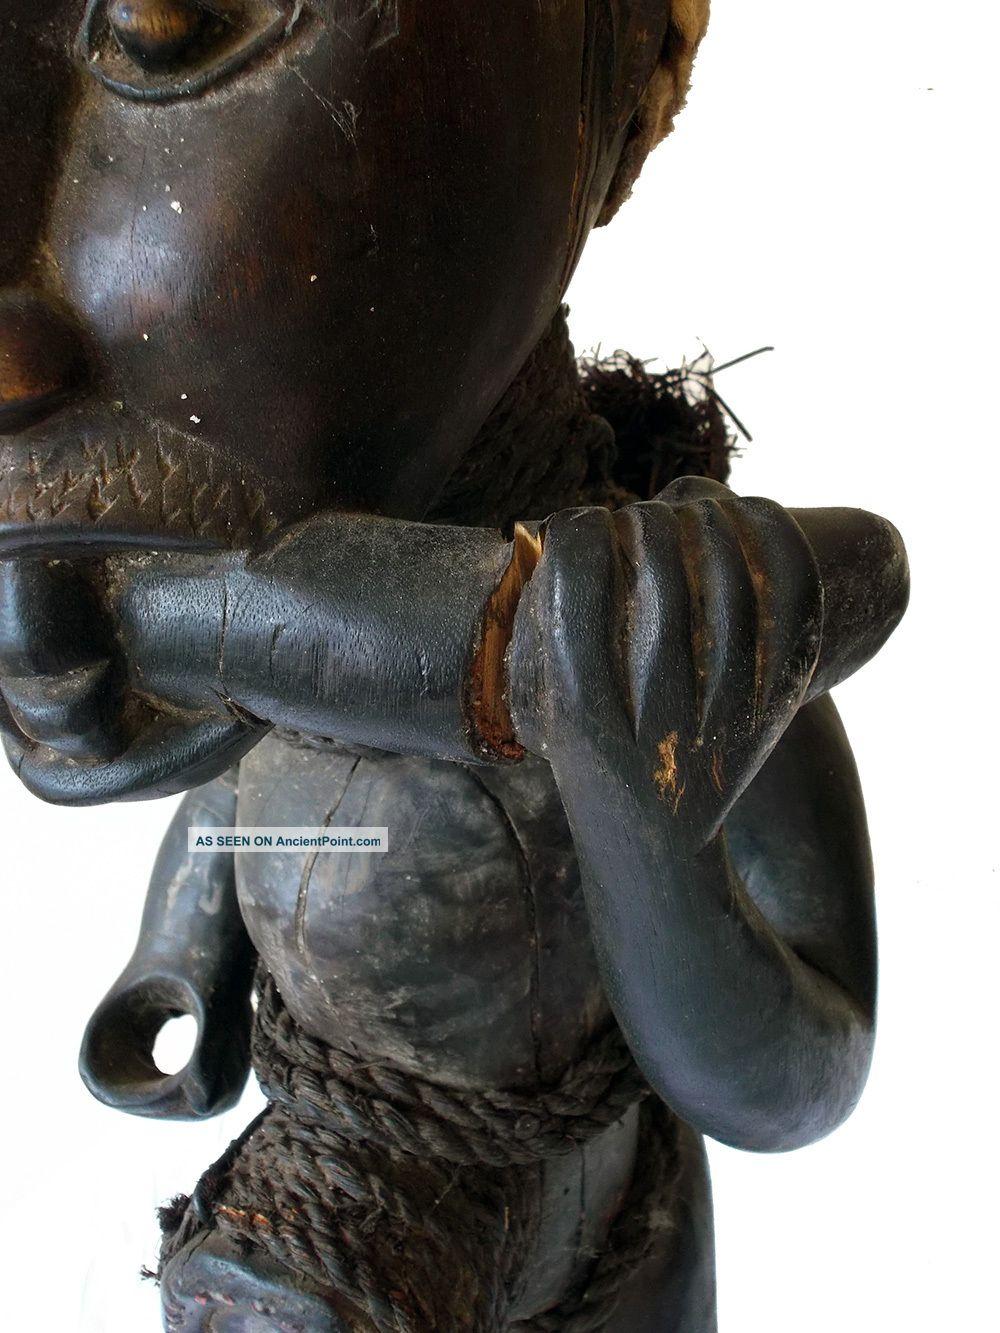 Kongo Tribe Nkisi Figure Zaire Congo Ritual Tribal Fetish Sculptures & Statues photo